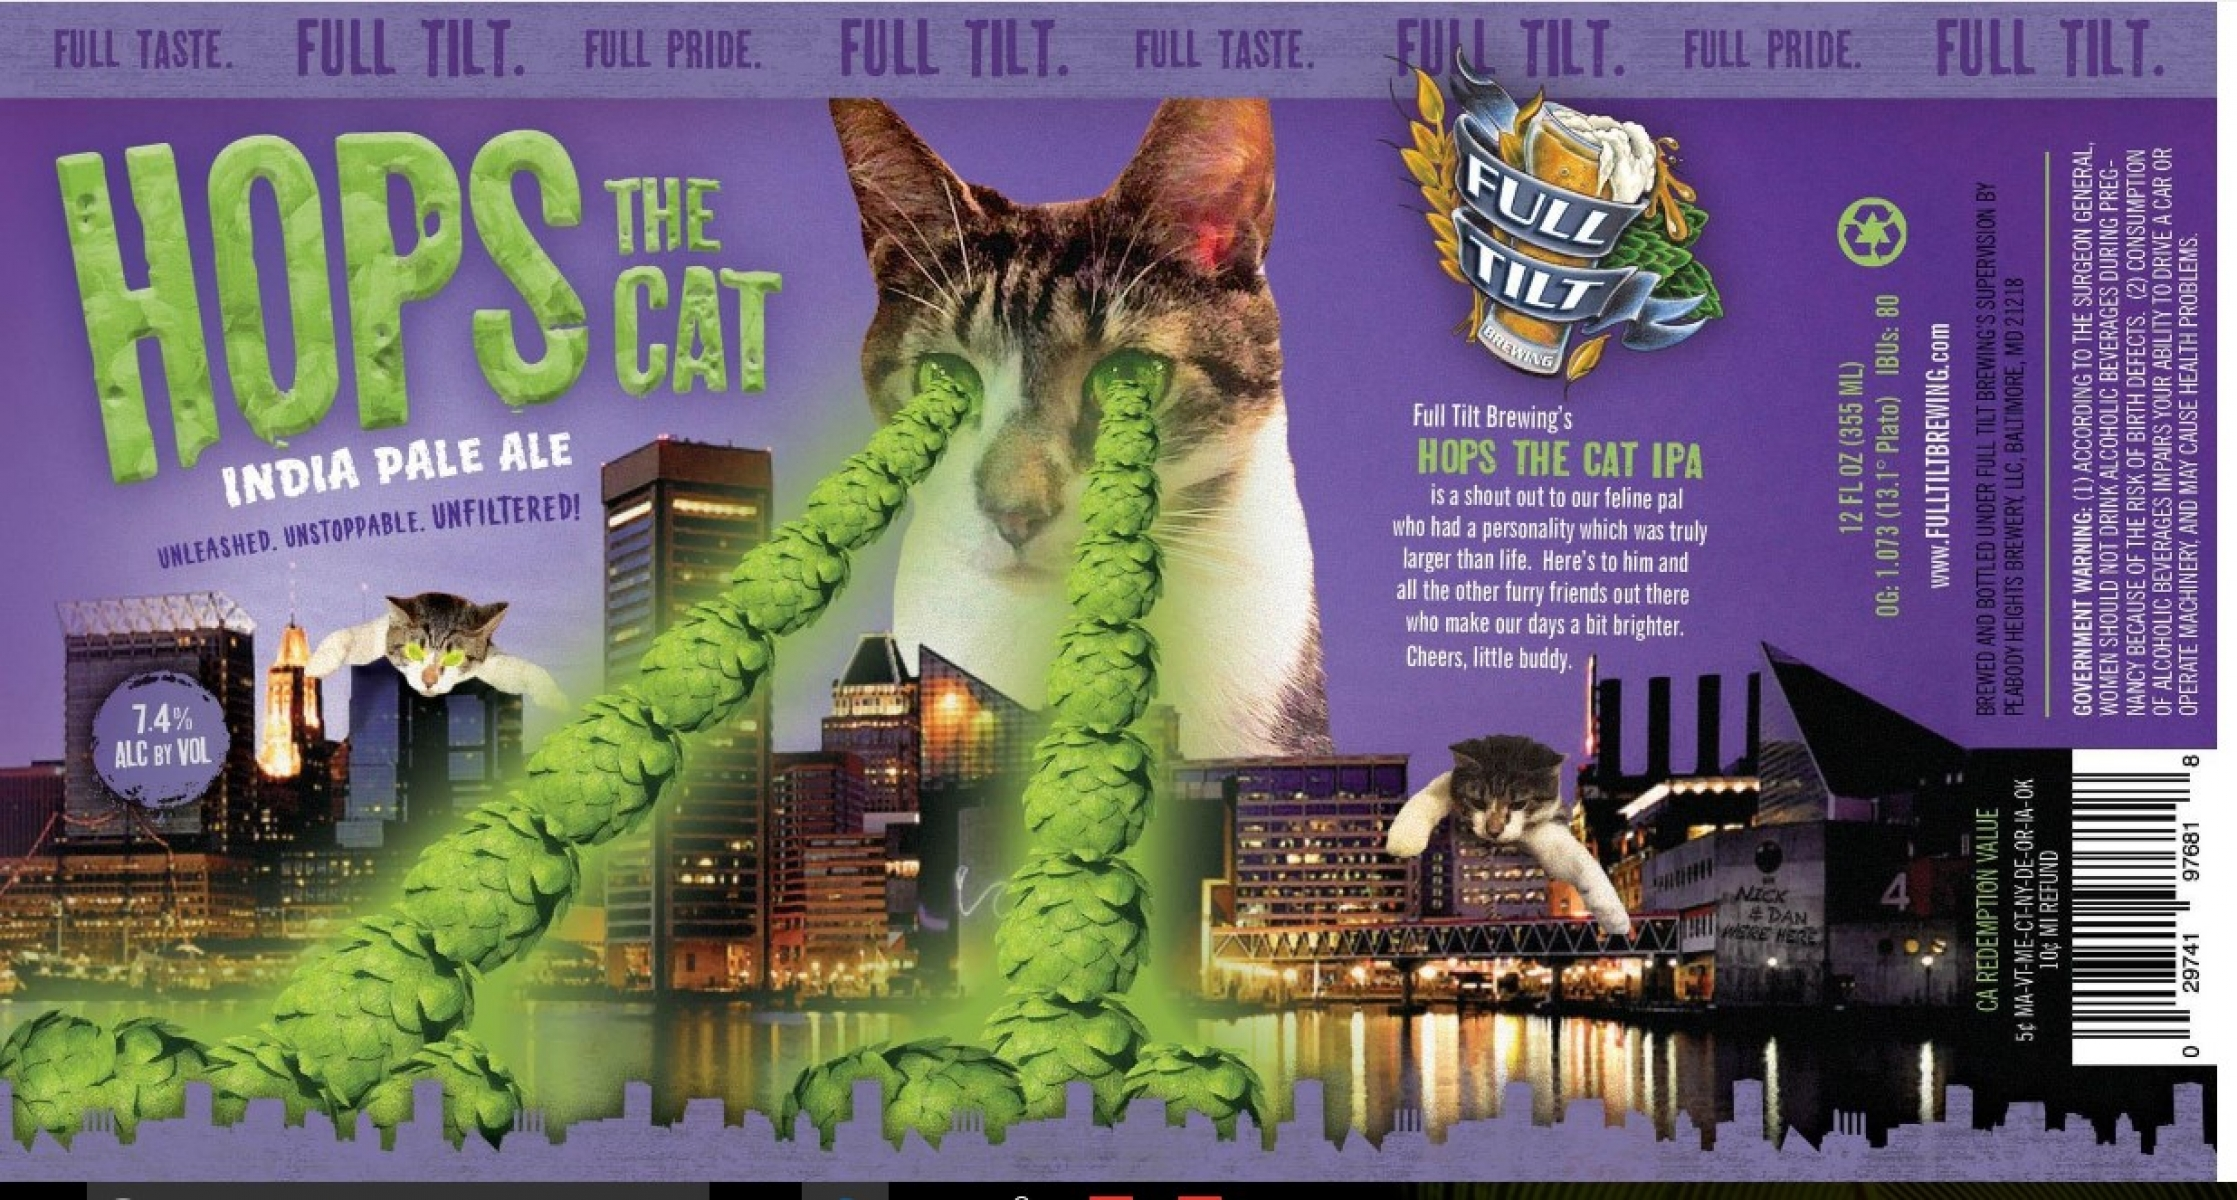 Hops The Cat IPA